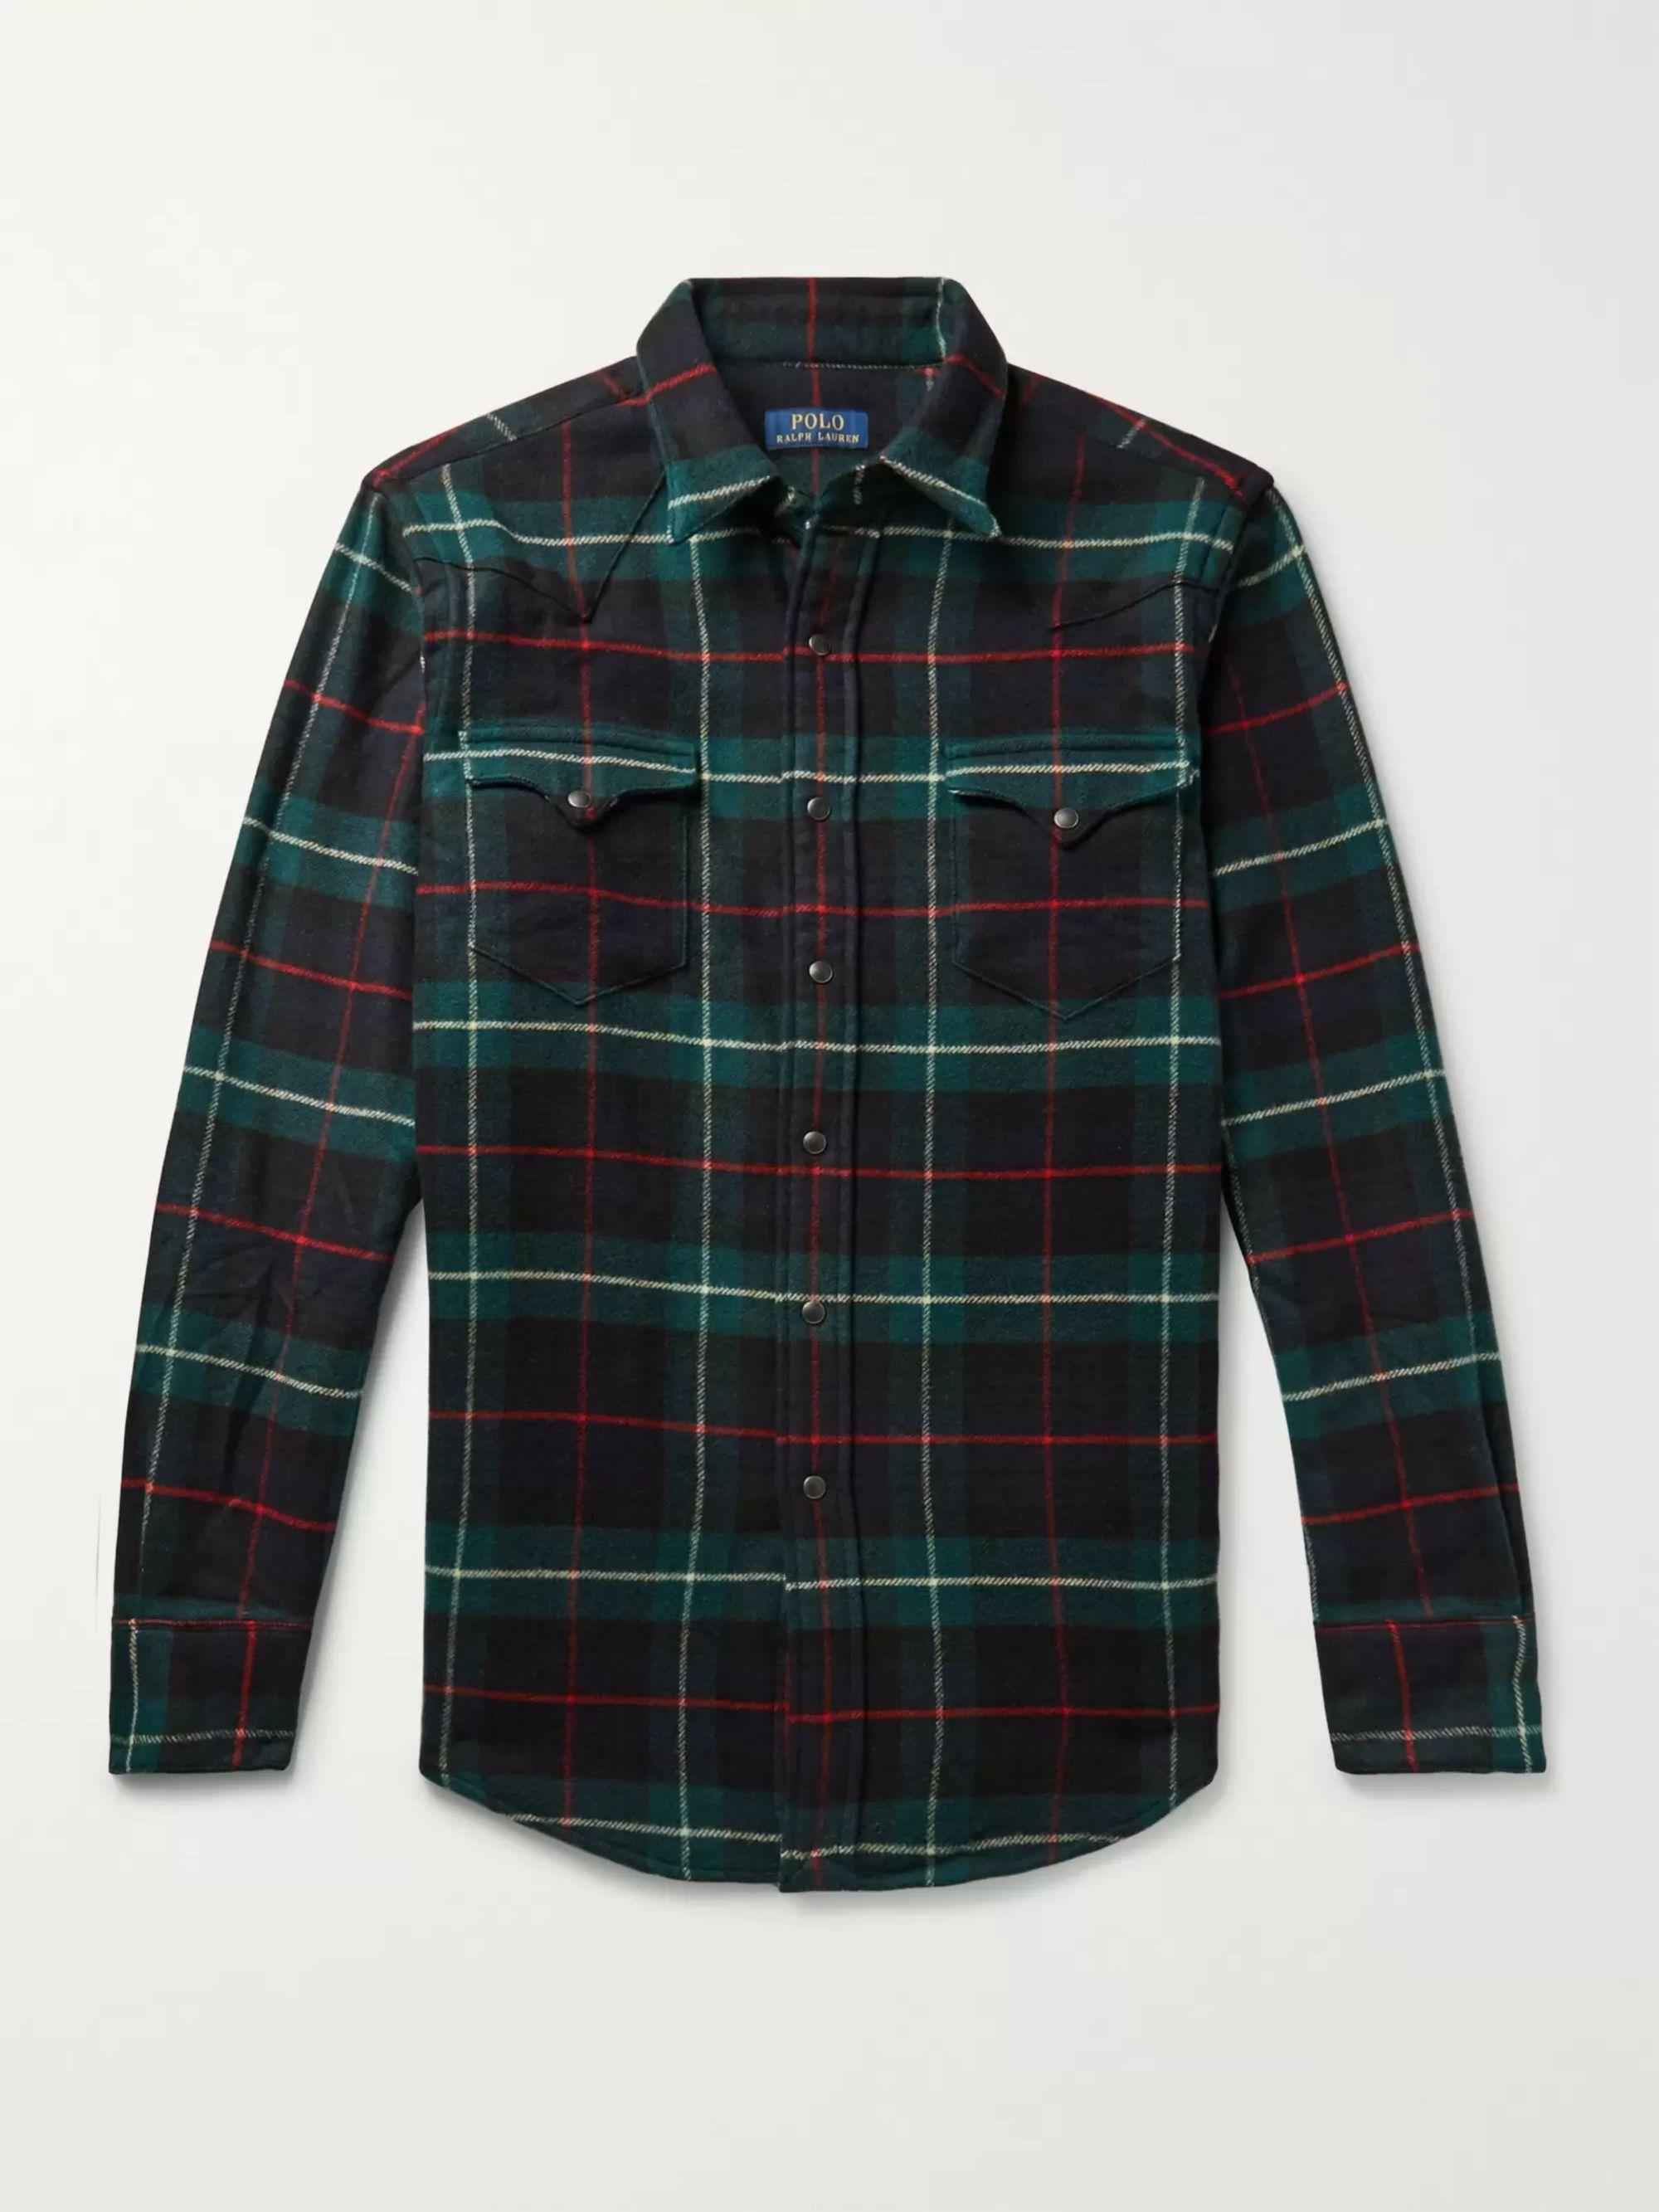 NWT Men/'s POLO RALPH LAUREN Fashion Red Plaid Cotton Twill Sport Casual Shirt